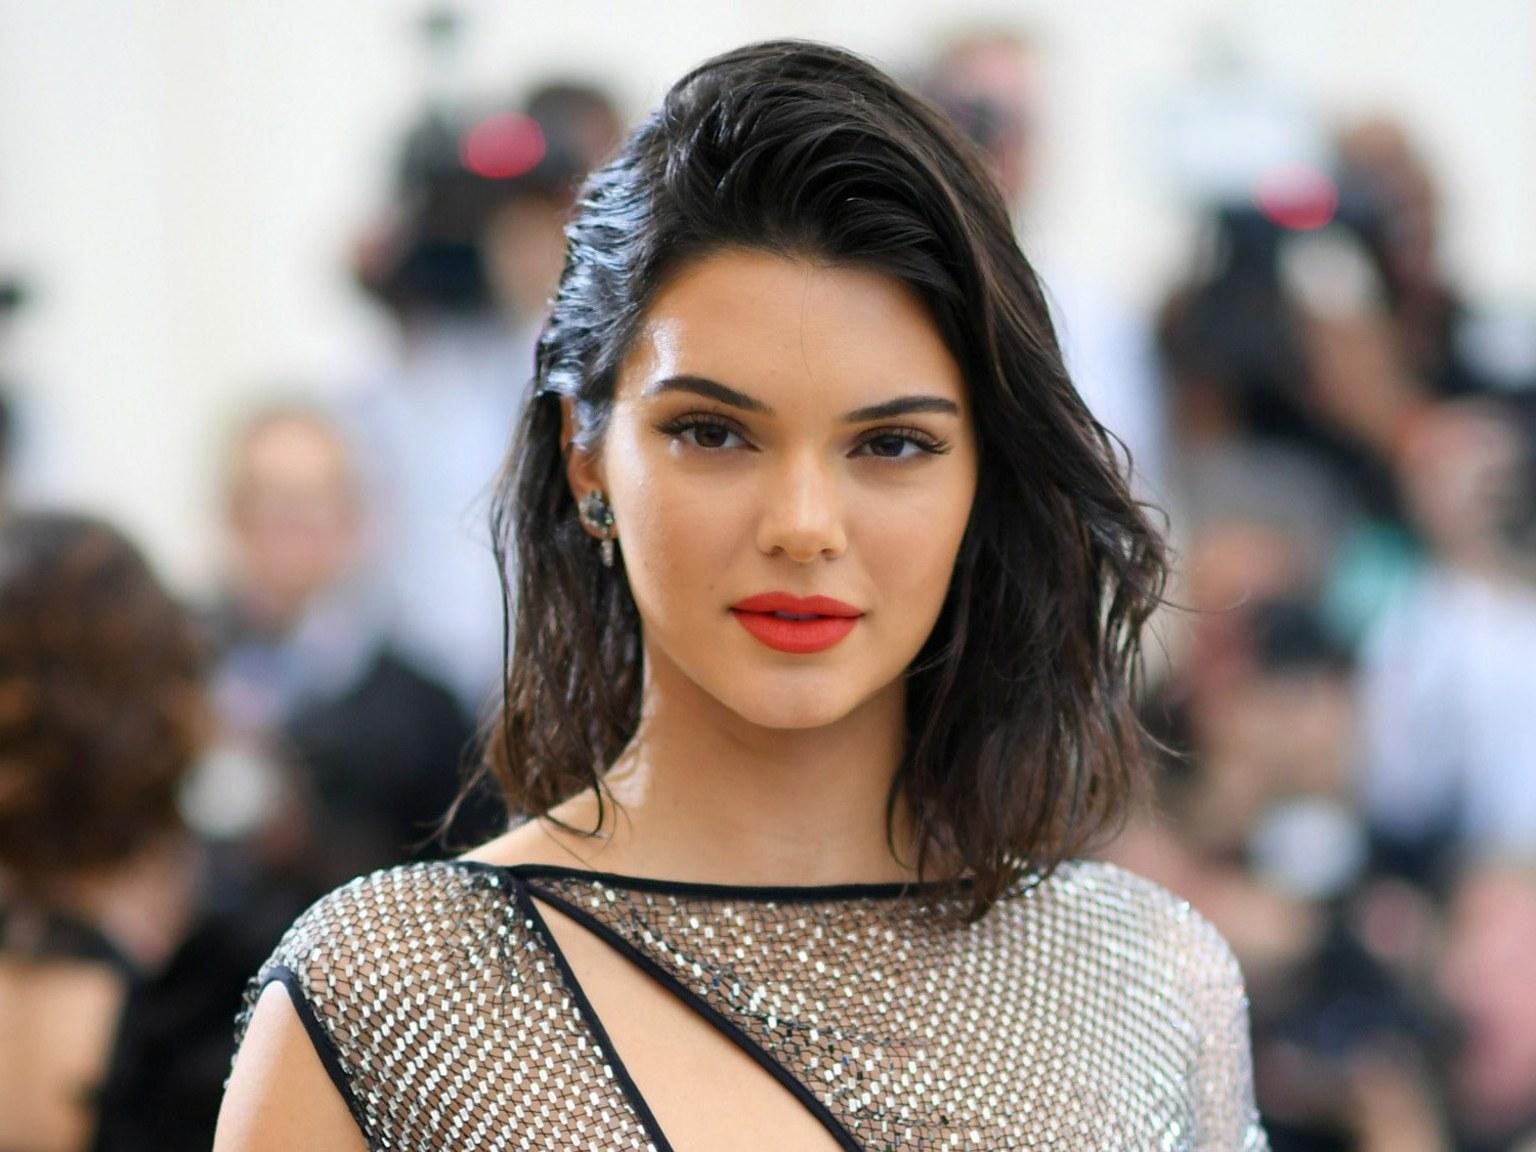 Kendall Jenner 2